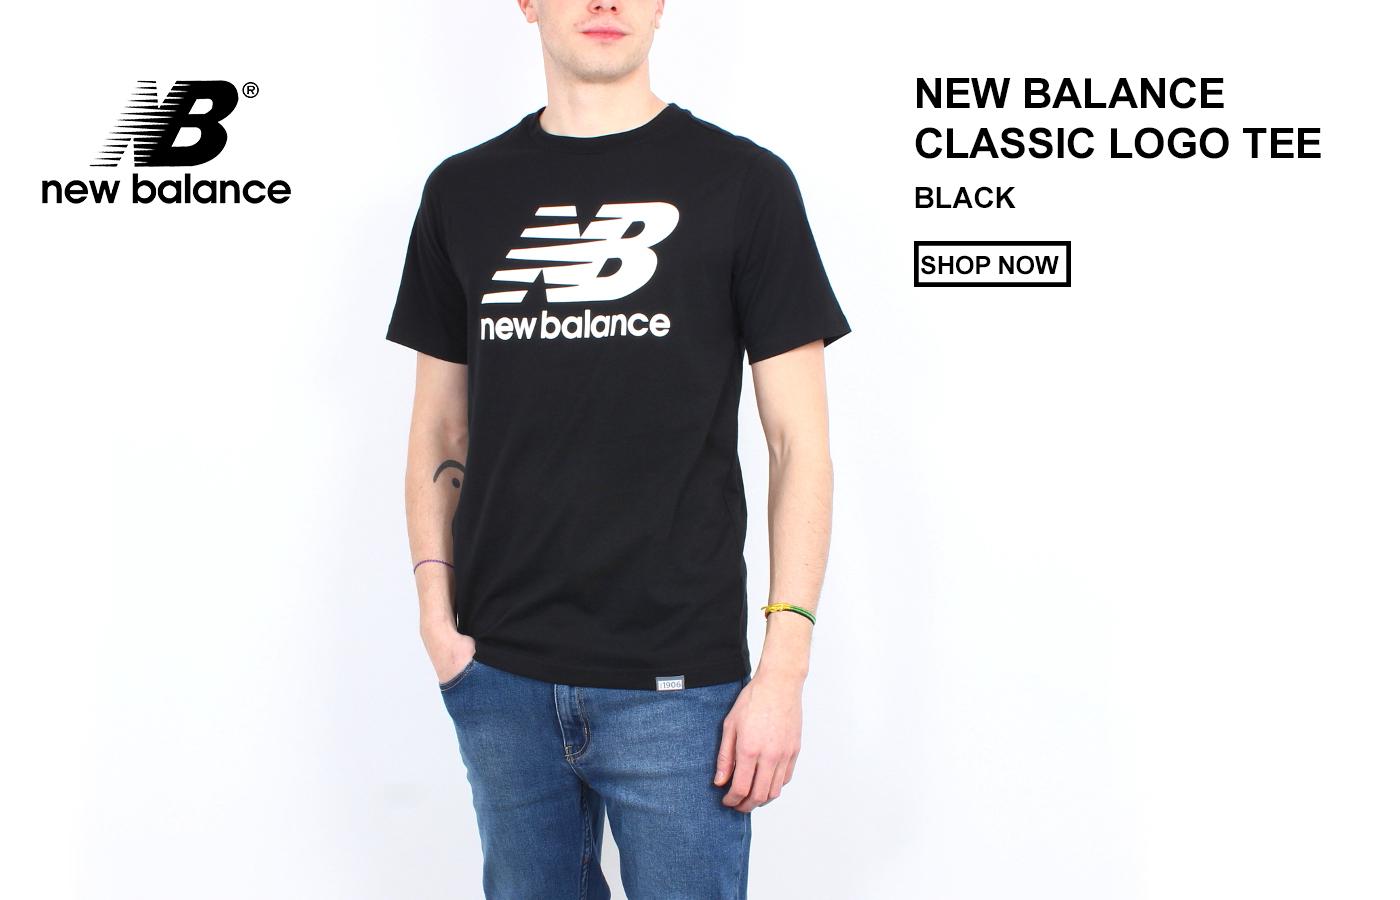 New Balance Classic Logo Tee